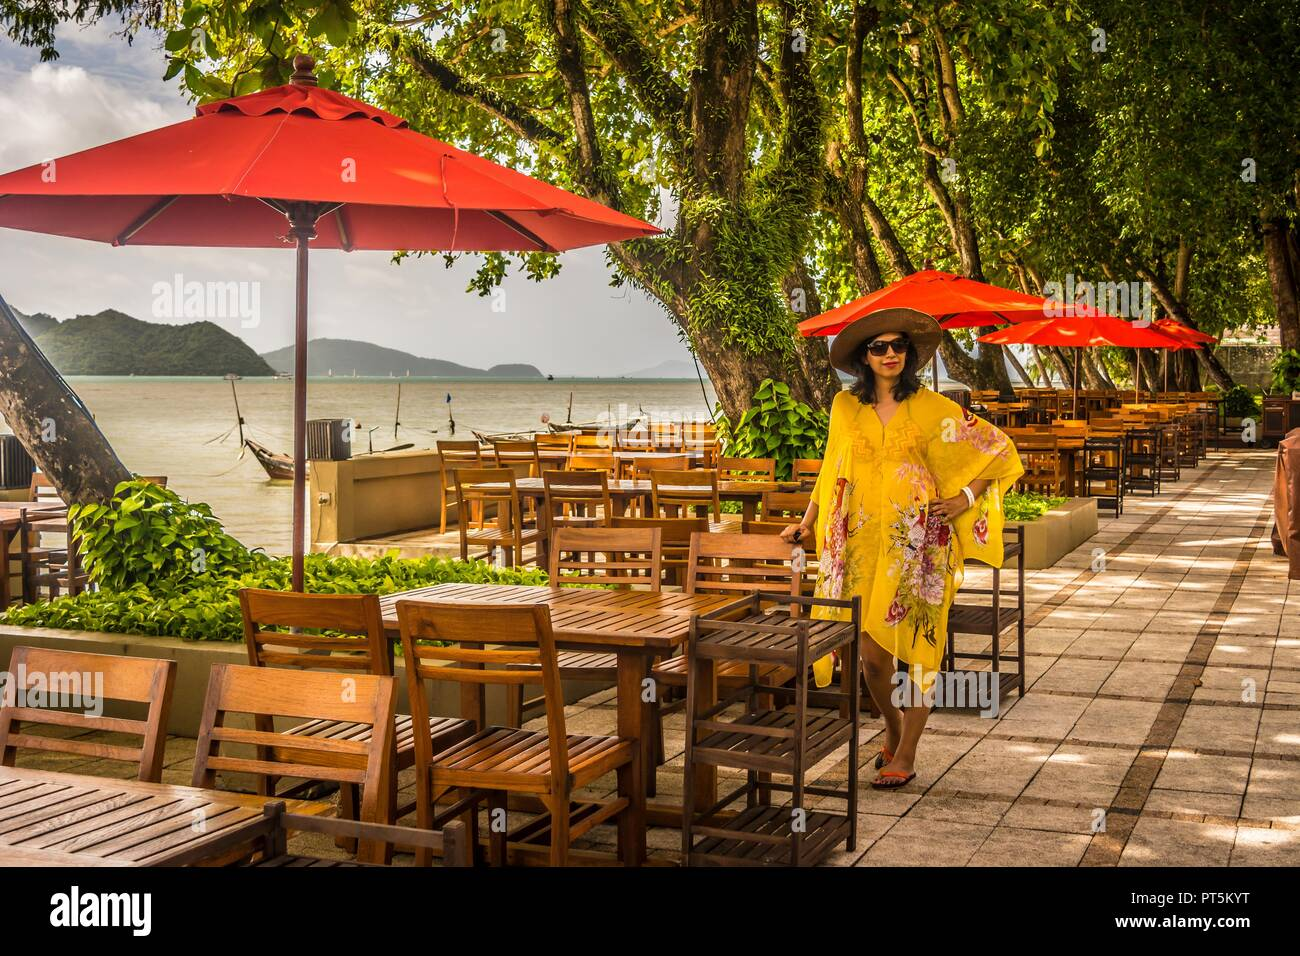 In Phuket, Thailand before going to banana island - Stock Image